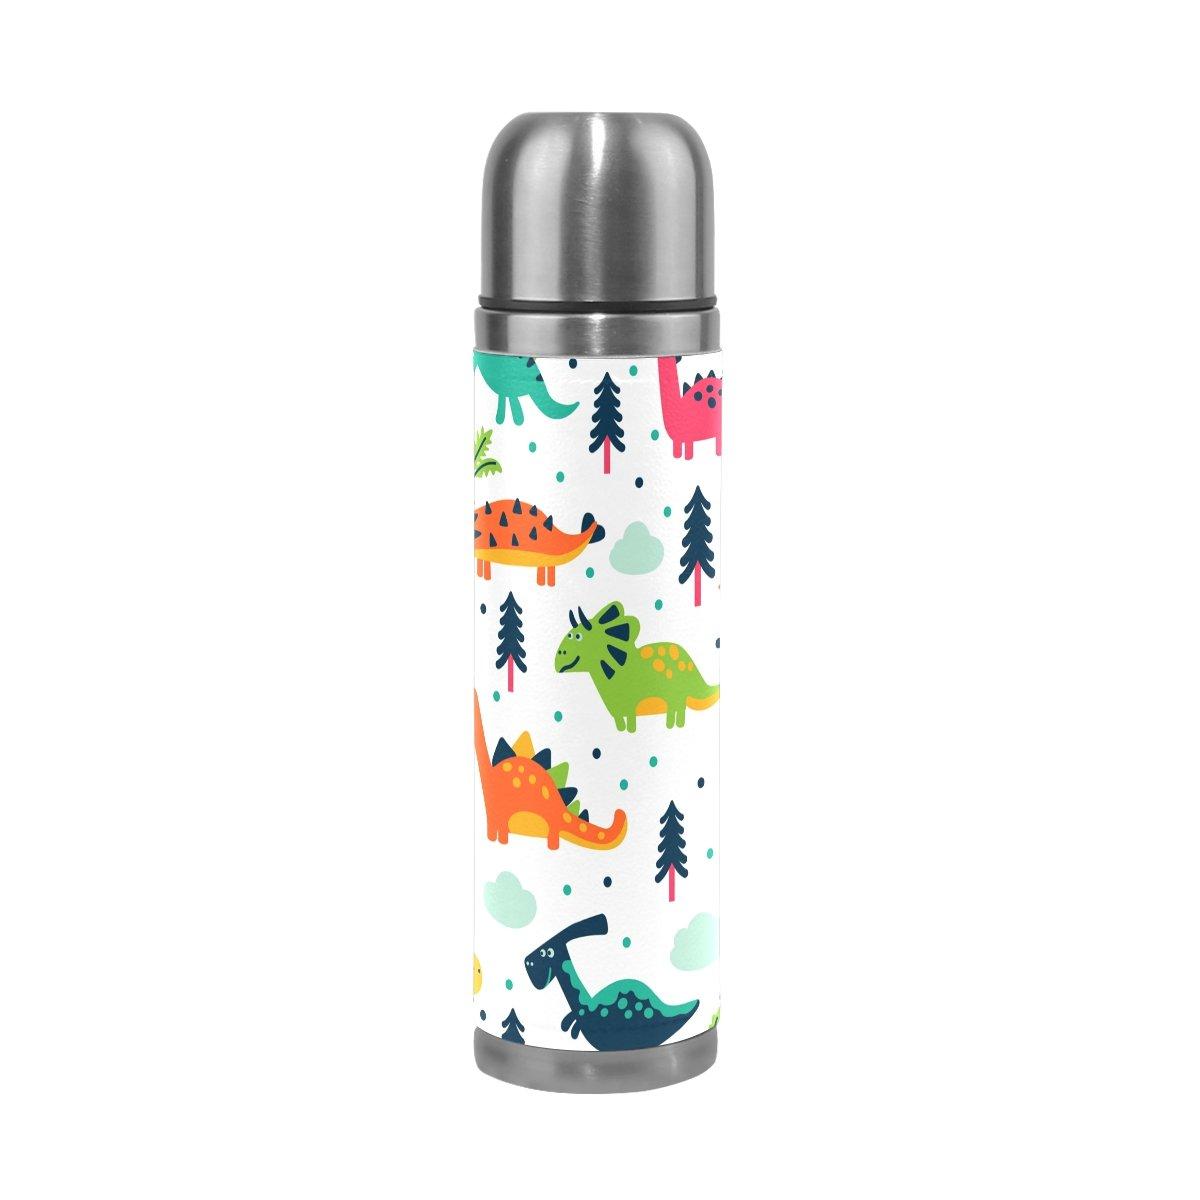 jstel – dinosaurios dibujos animados aislado al agua vacío botella de agua al de acero inoxidable a prueba de fugas botella de doble vacío para café caliente o frío taza de té + bebida Top 500 ml 7c9b91